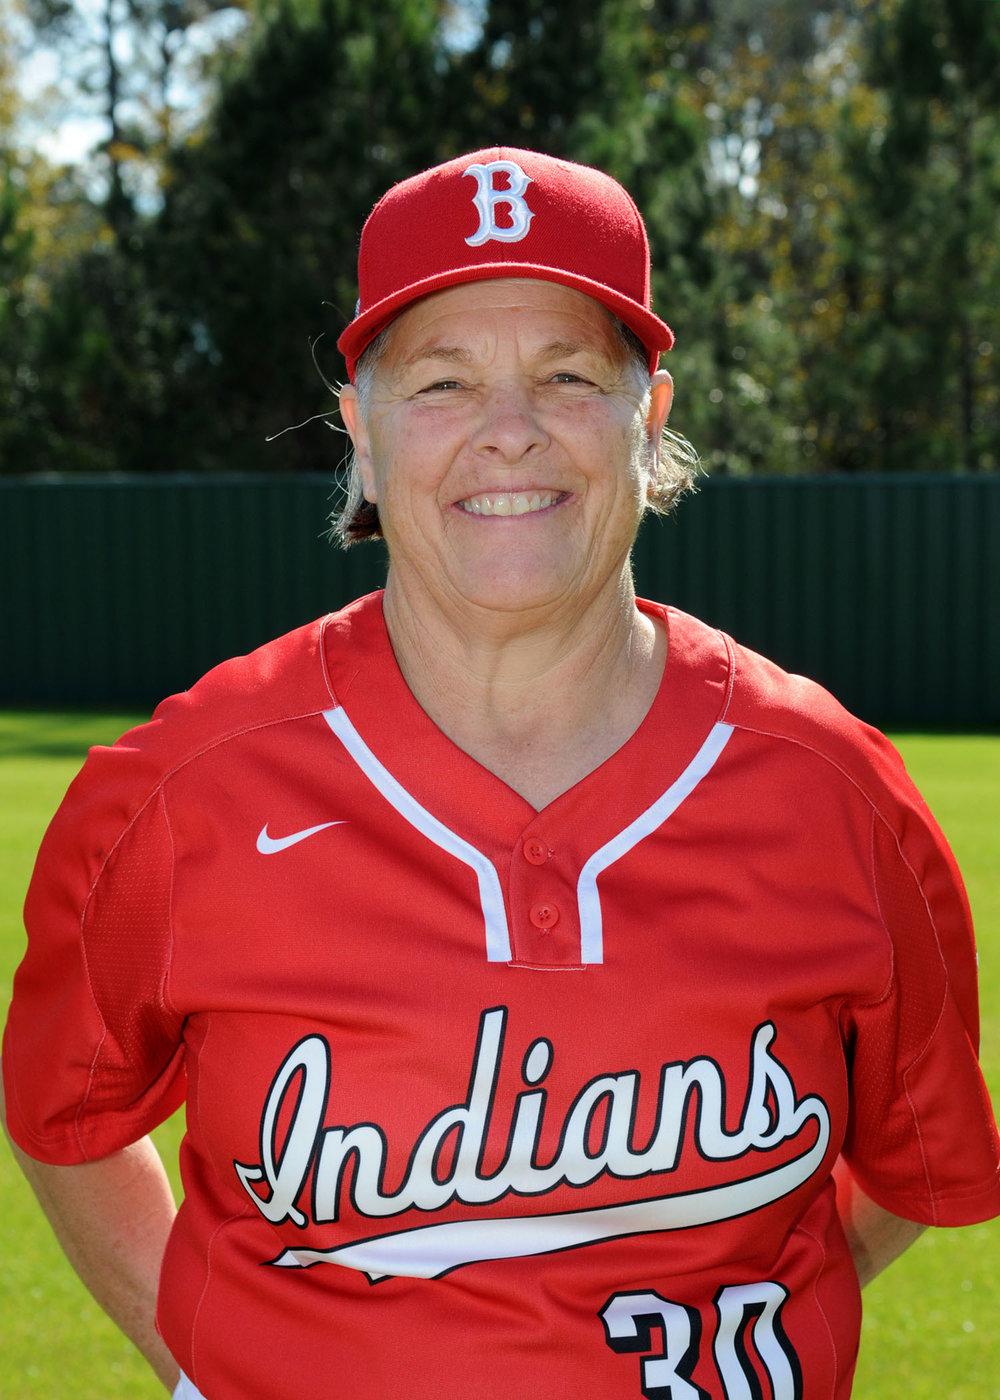 Asst. Coach Pam Ferrill - Bio Goes Here